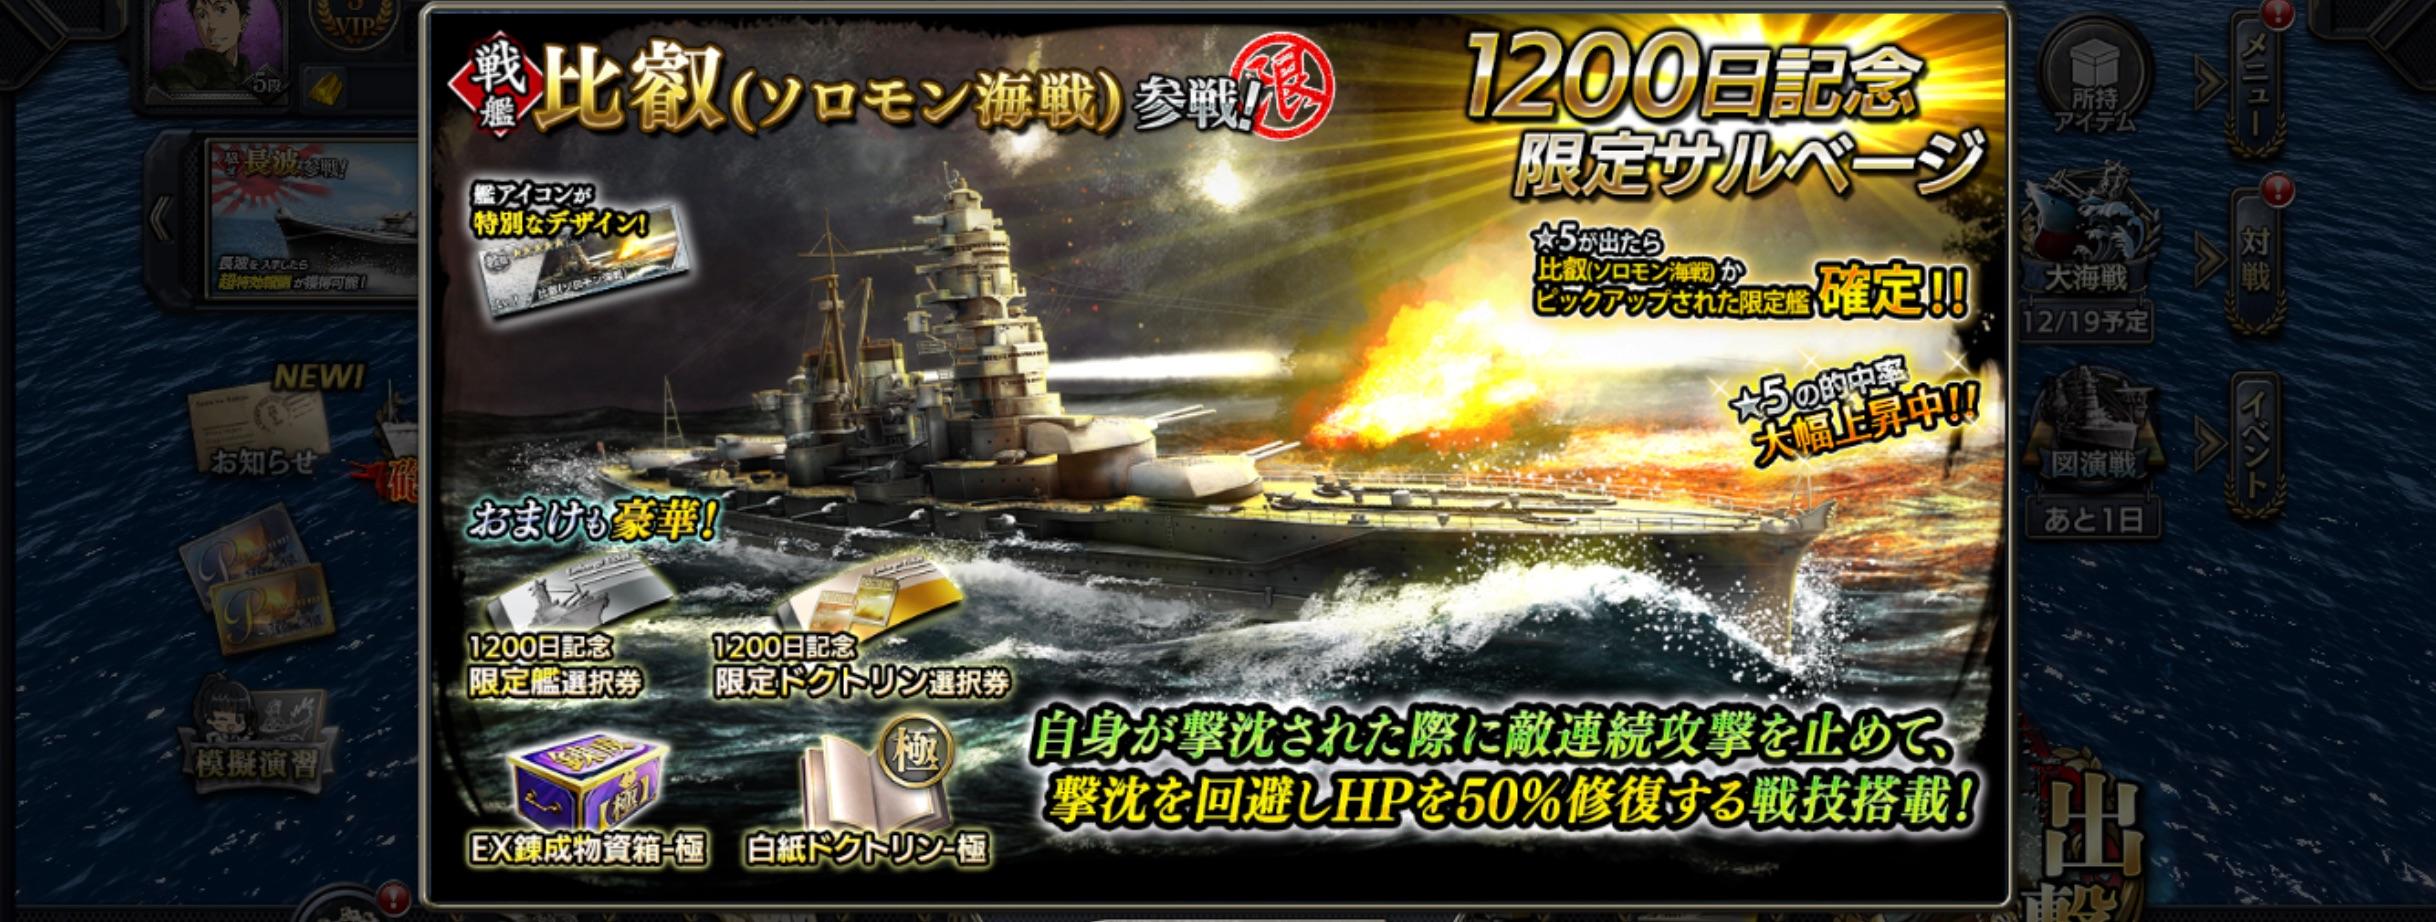 battleship-HieiS